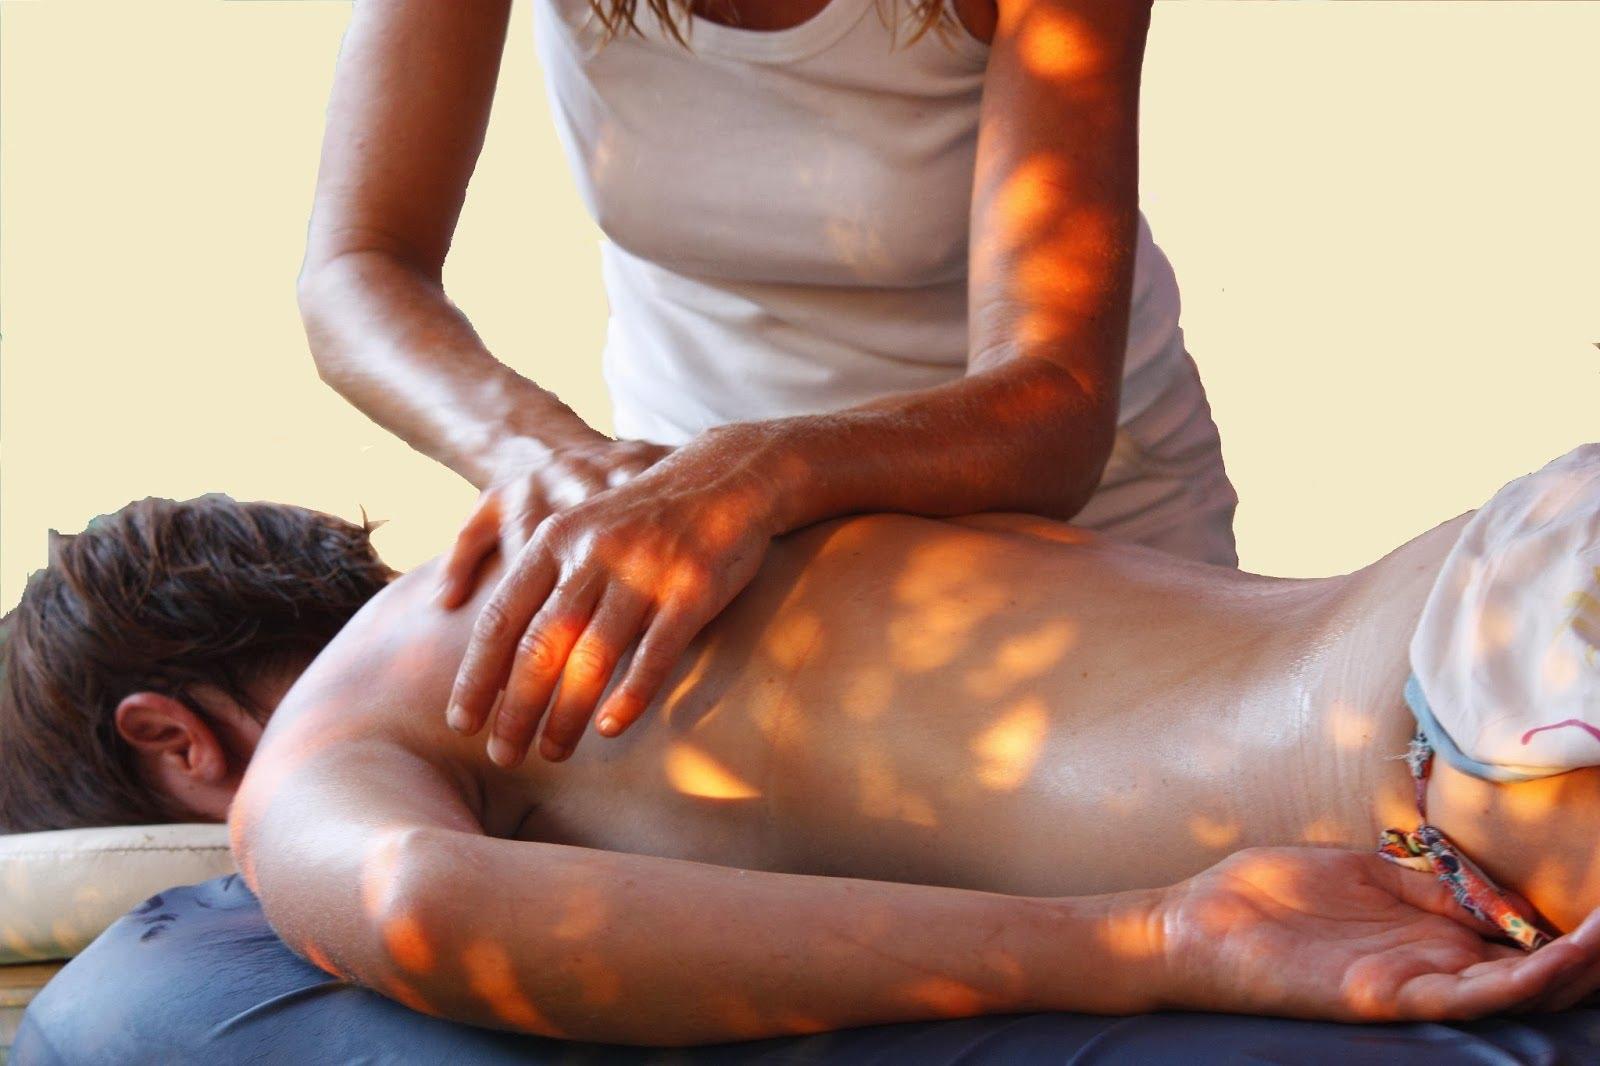 Что это - лингама? техника массажа лингама